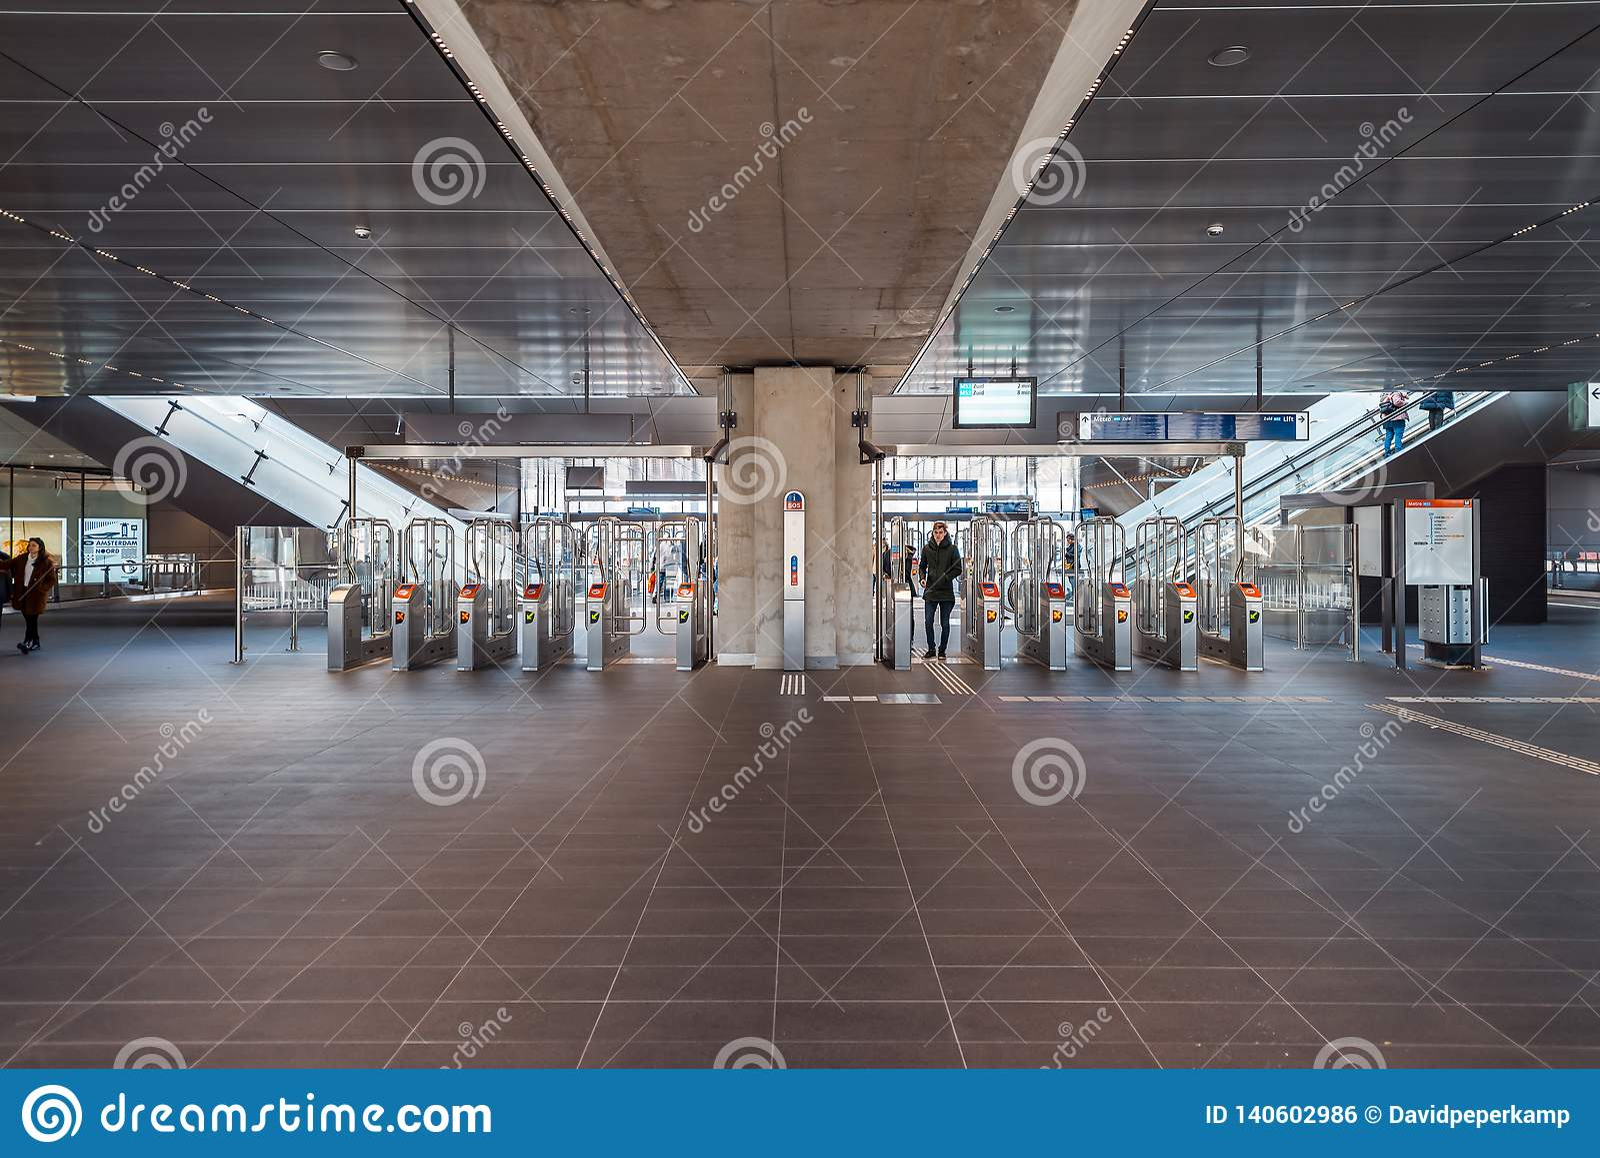 Metro, metro, stacja metra Amsterdam Noord/, Nederland